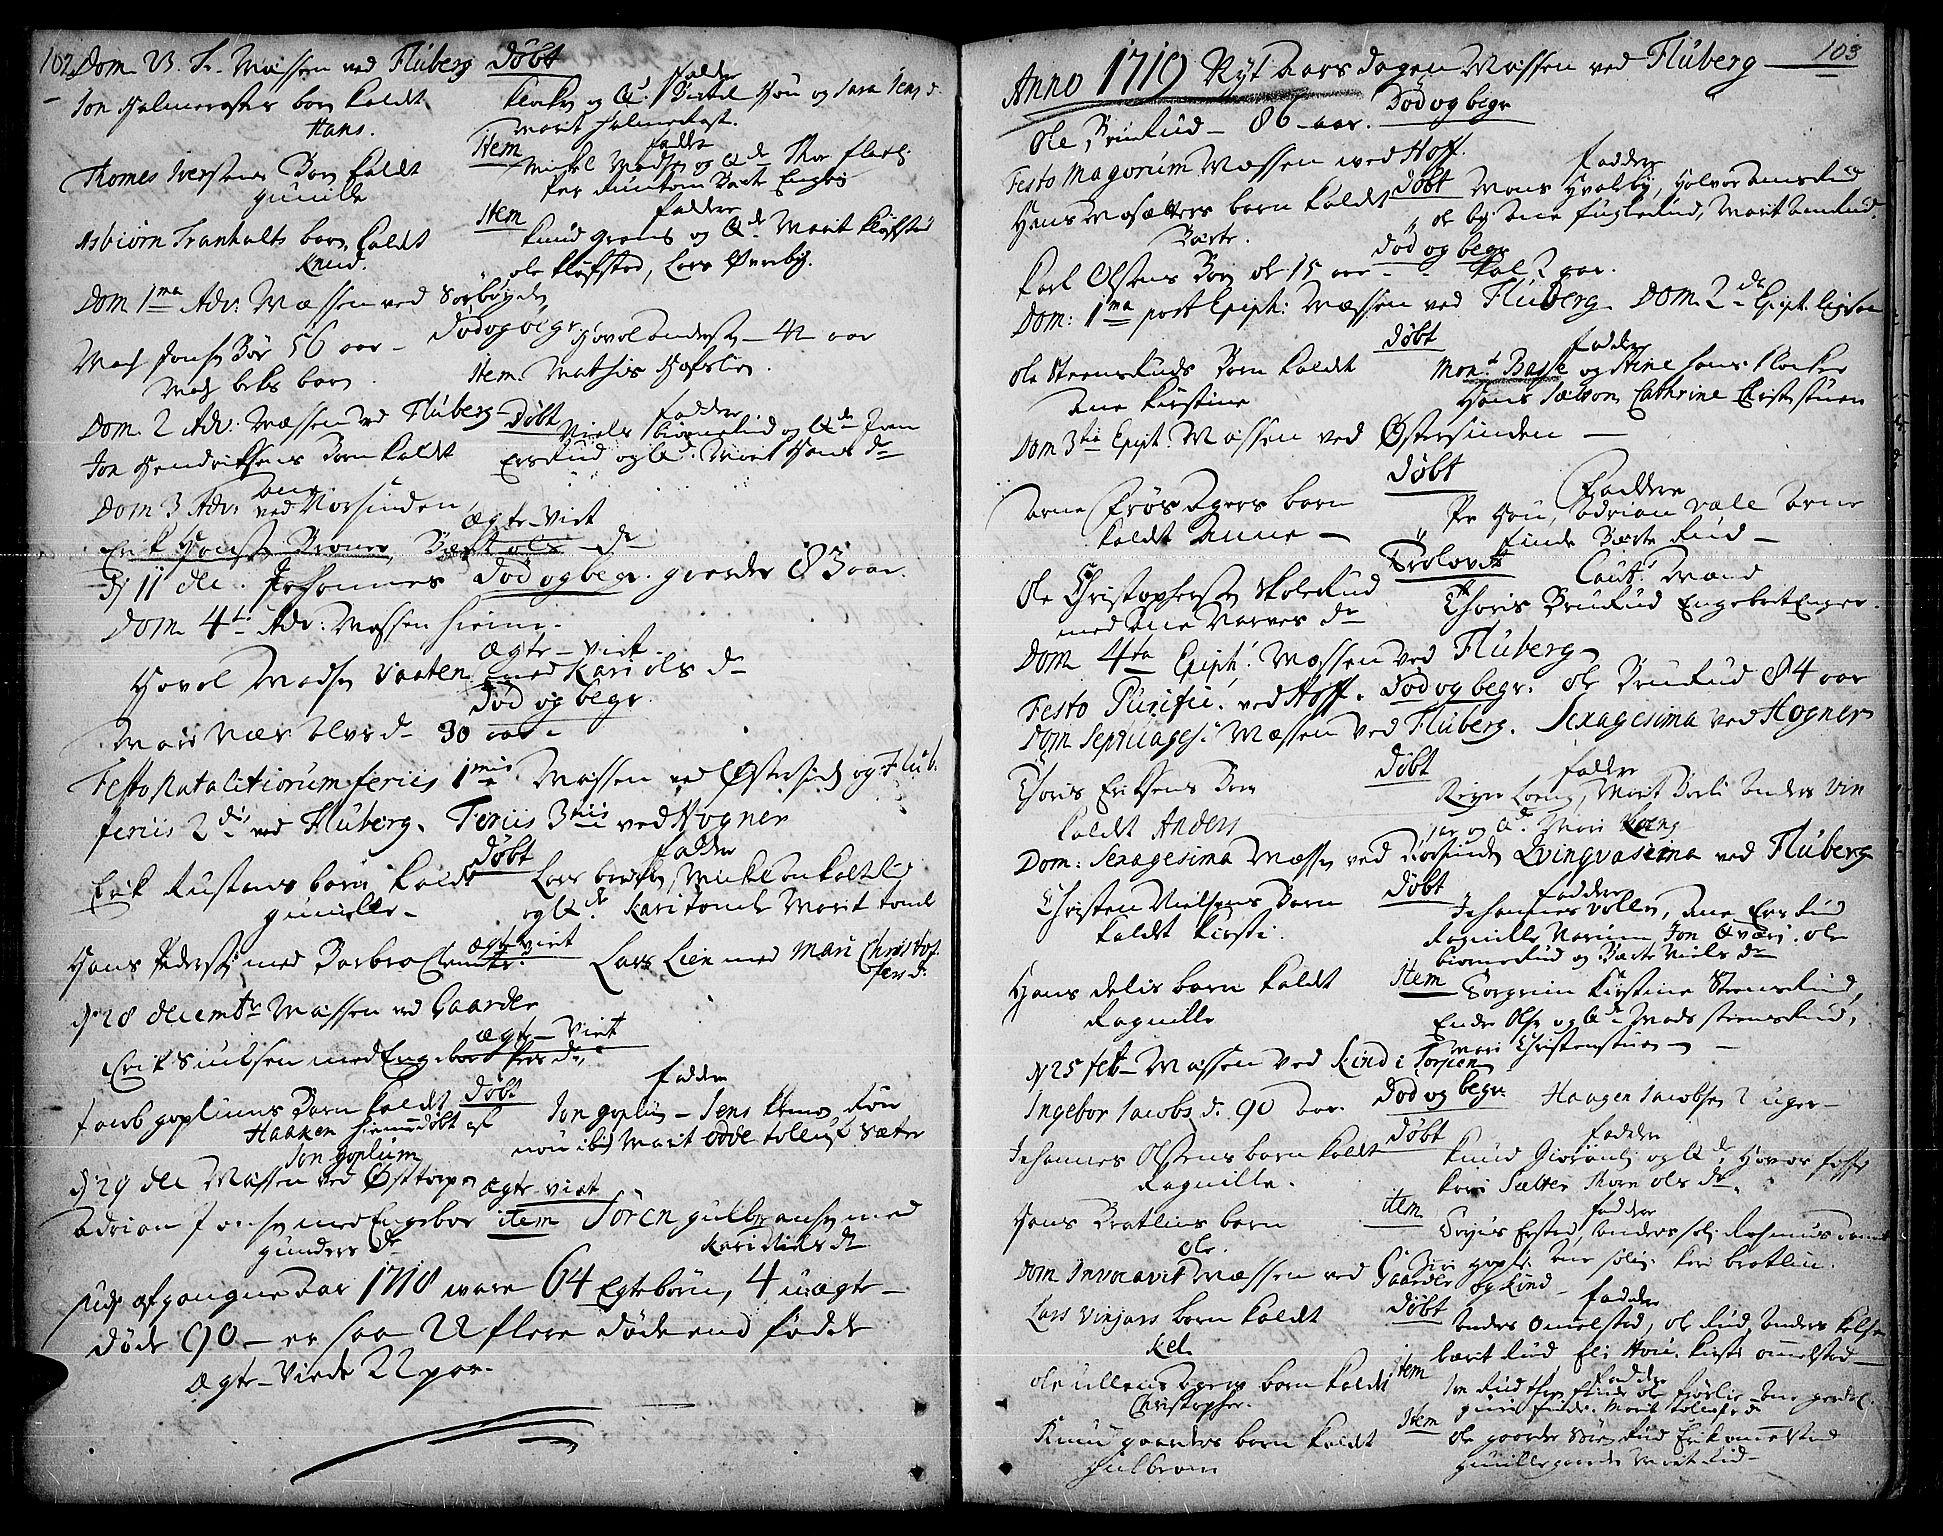 SAH, Land prestekontor, Ministerialbok nr. 1, 1708-1732, s. 102-103